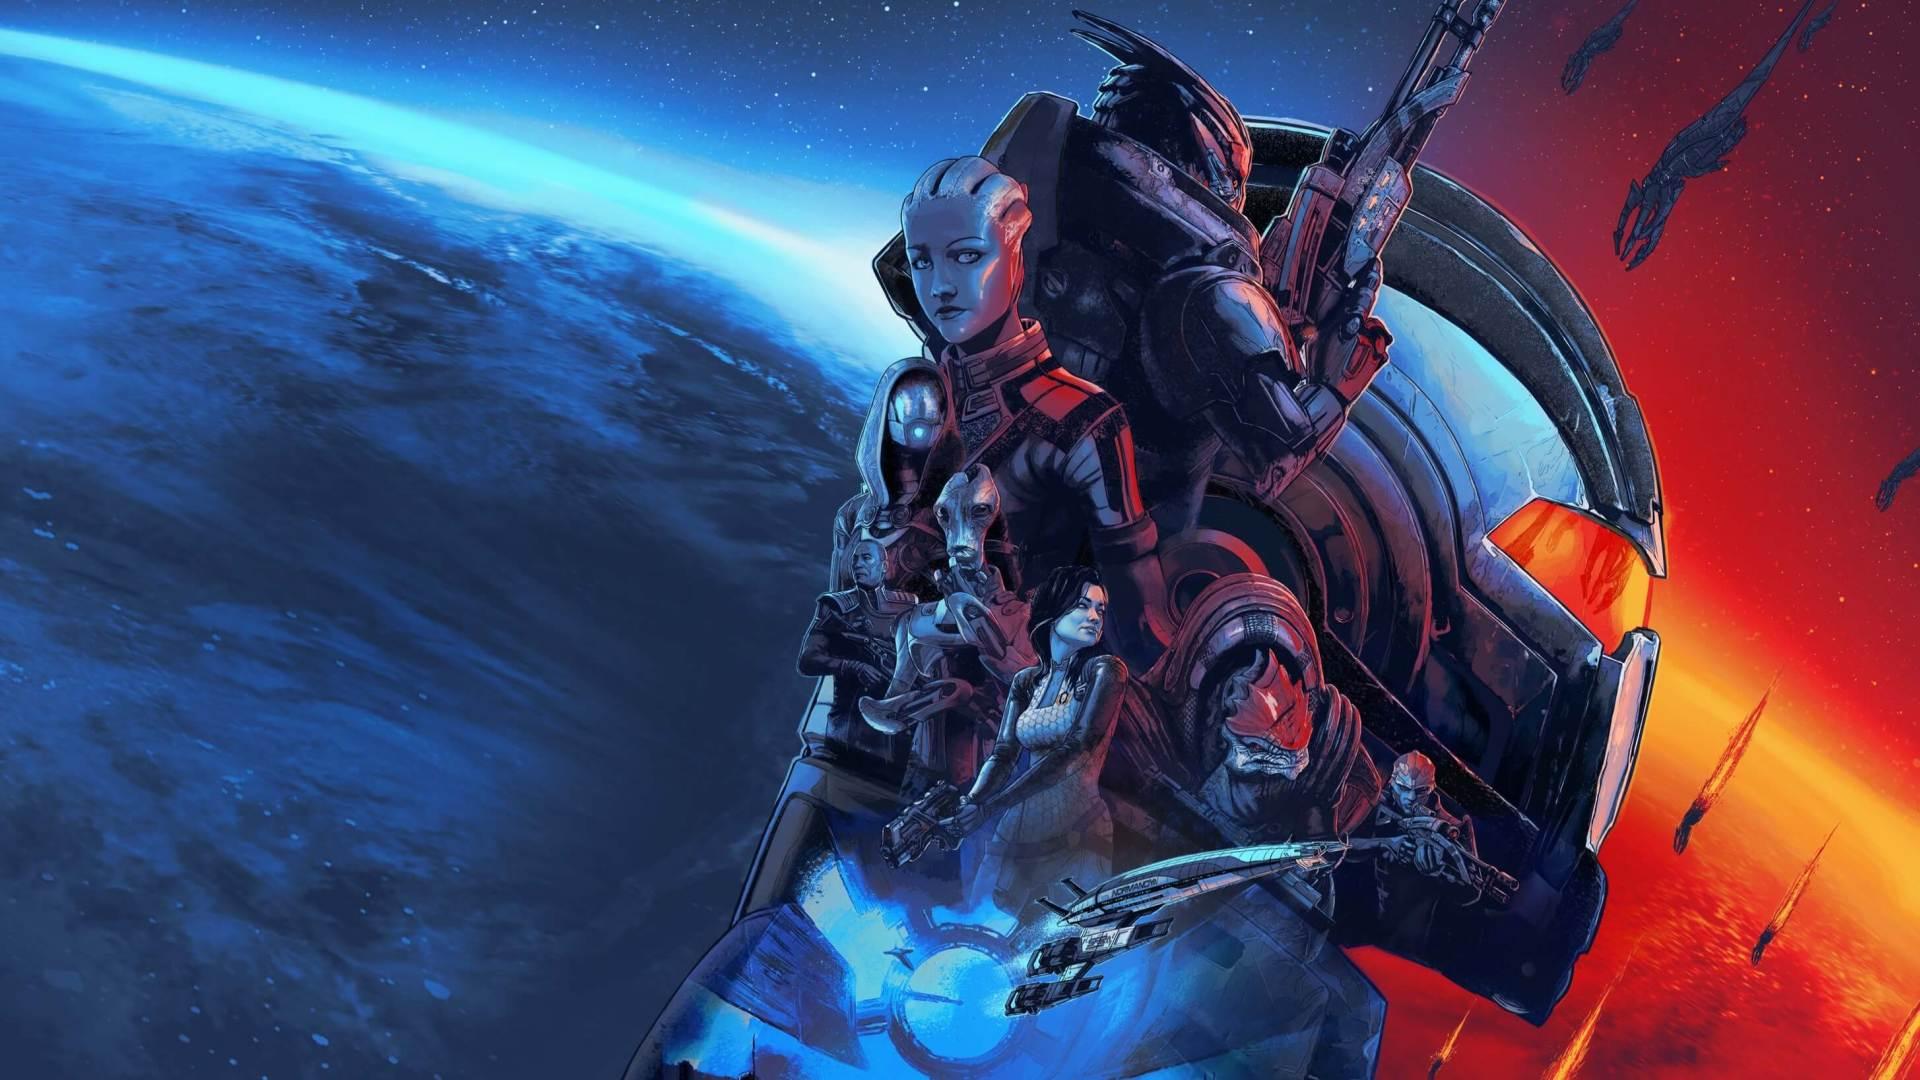 BioWare details how it's rebalancing Mass Effect for the Legendary Edition screenshot